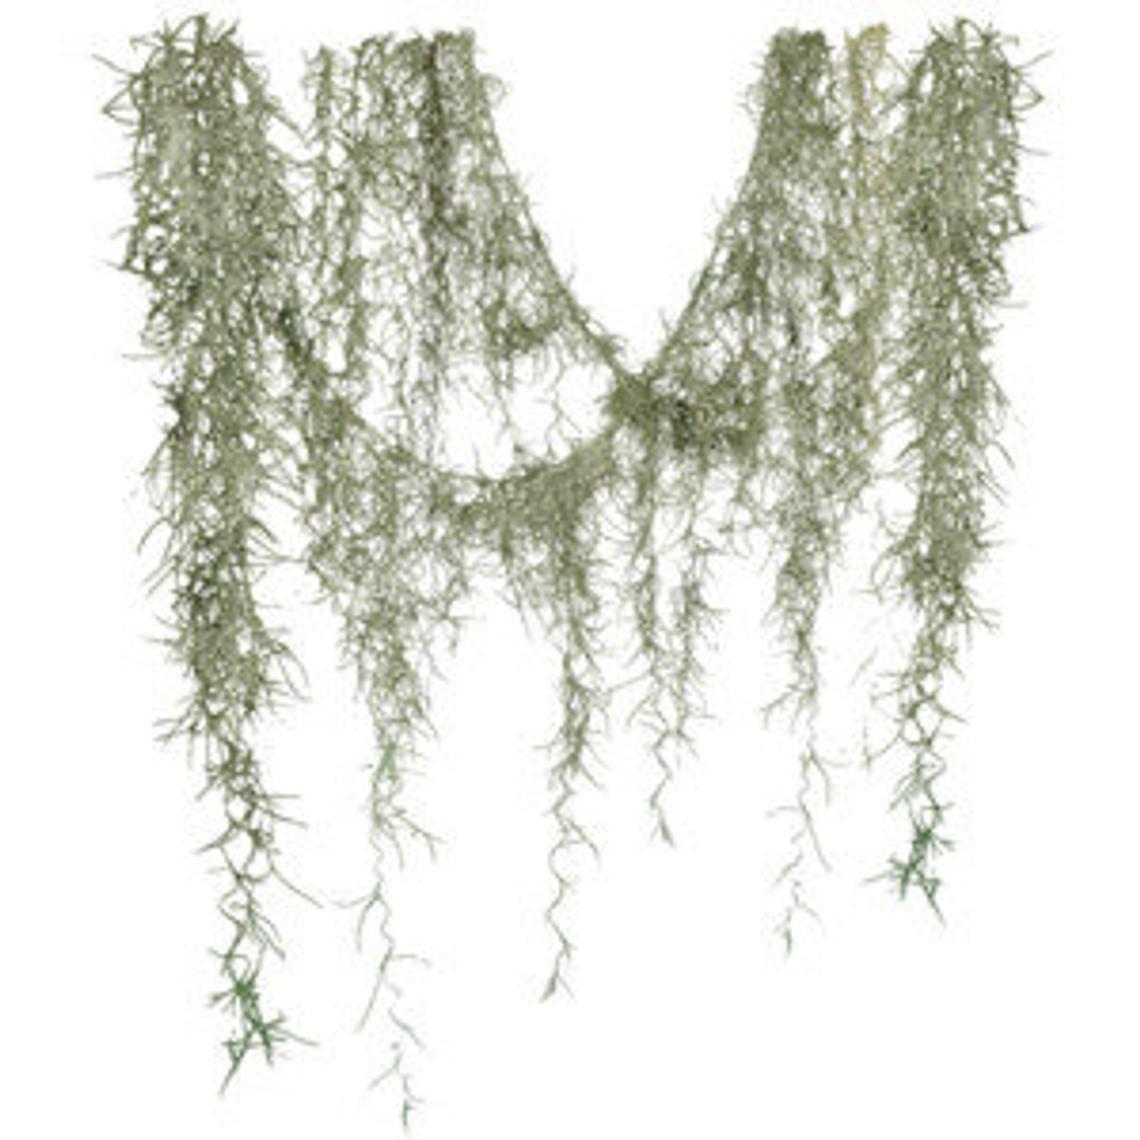 Spanish Moss Tillandsia Usneoides Plant Better Known As Etsy Spanish Moss Tillandsia Moss